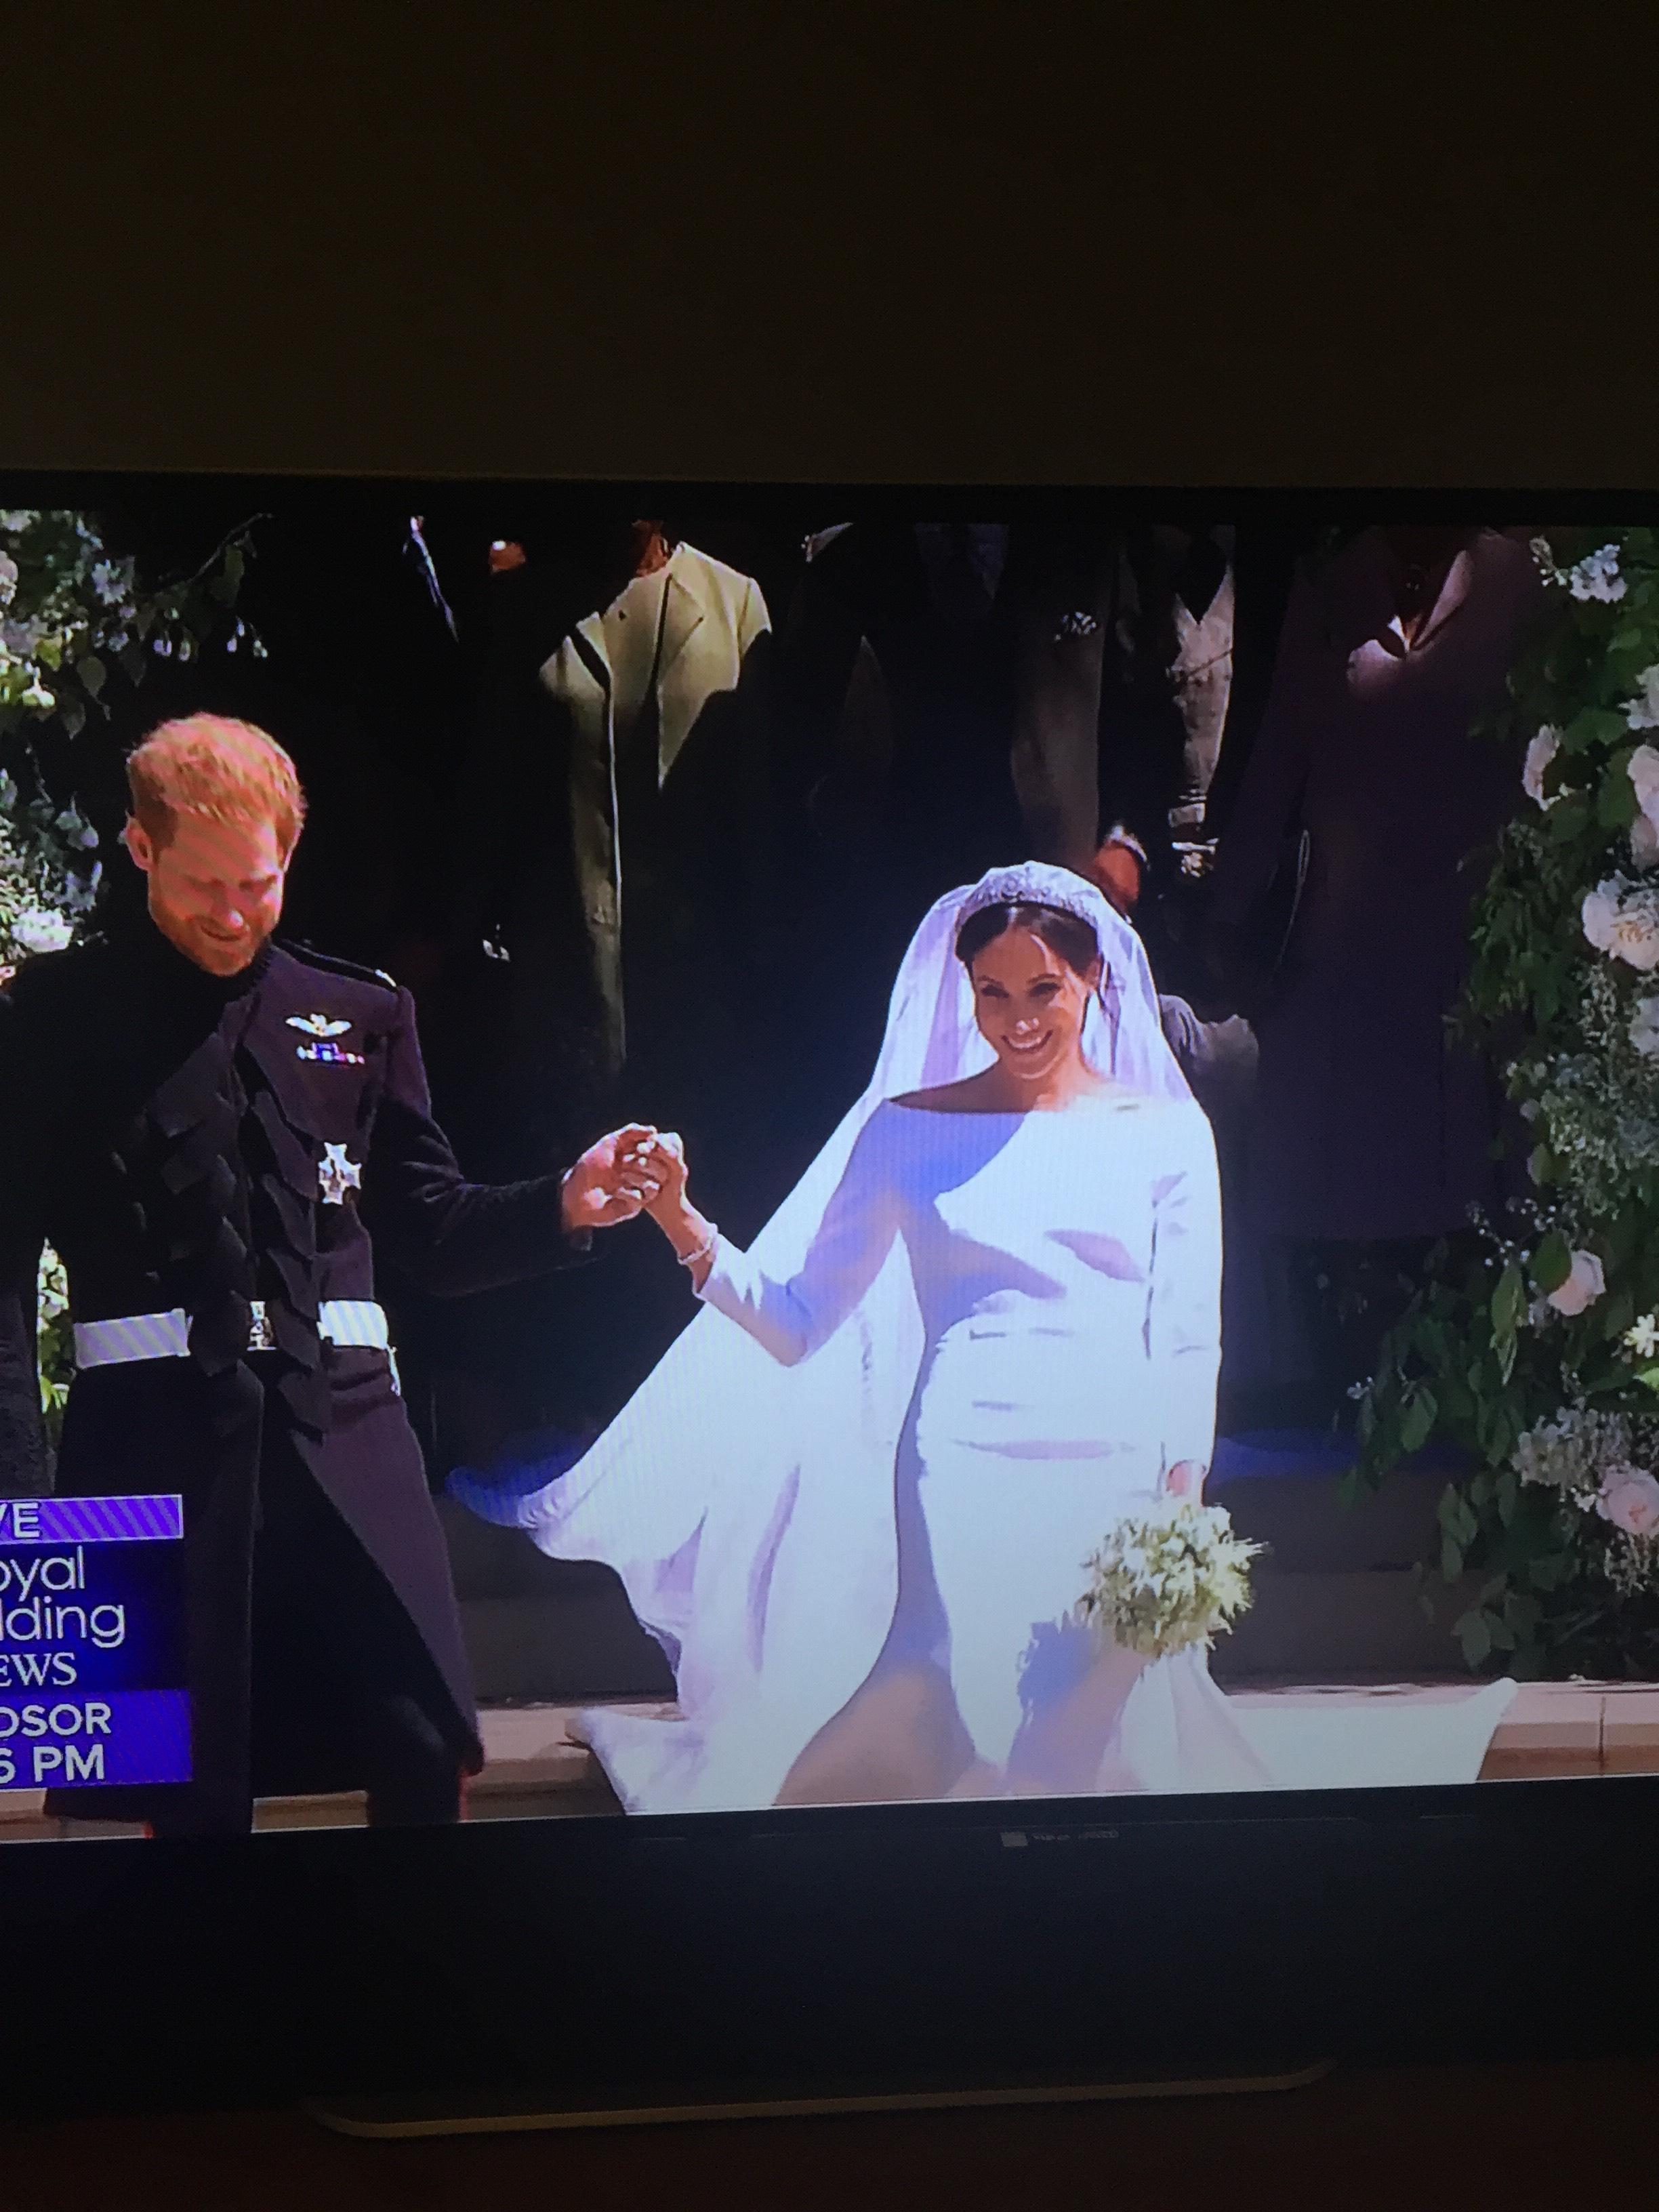 Royal Wedding.jpeg